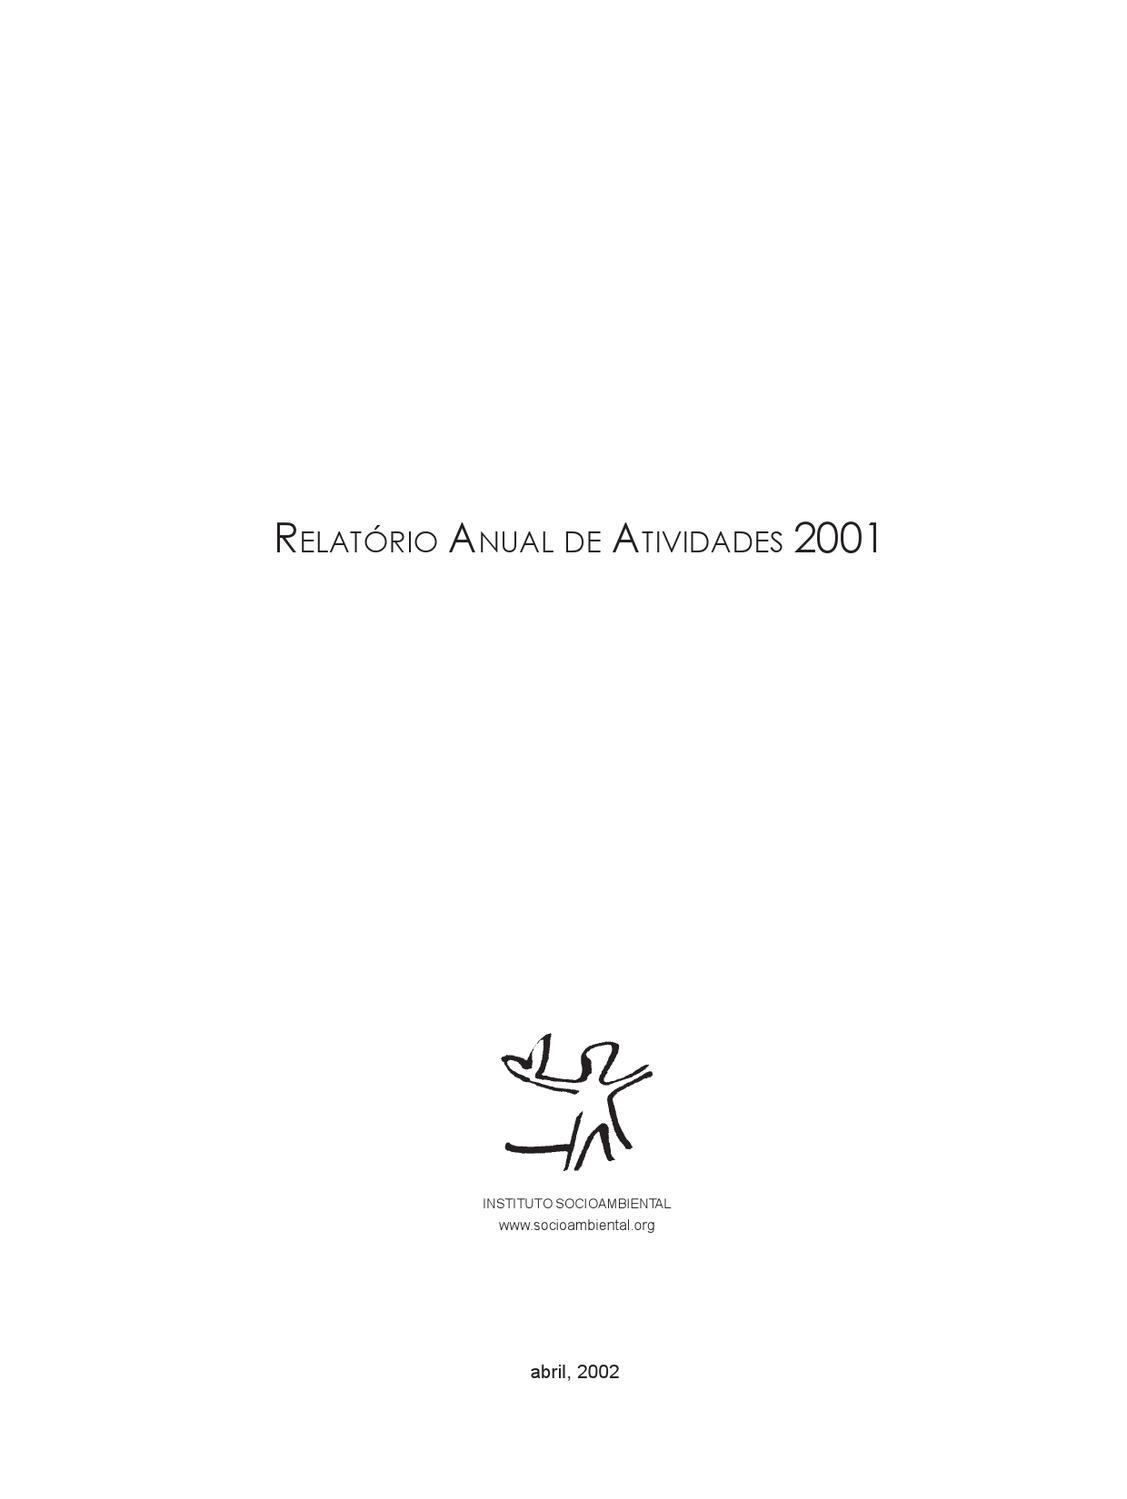 1109884e9e03c rel2001 by Instituto Socioambiental - issuu